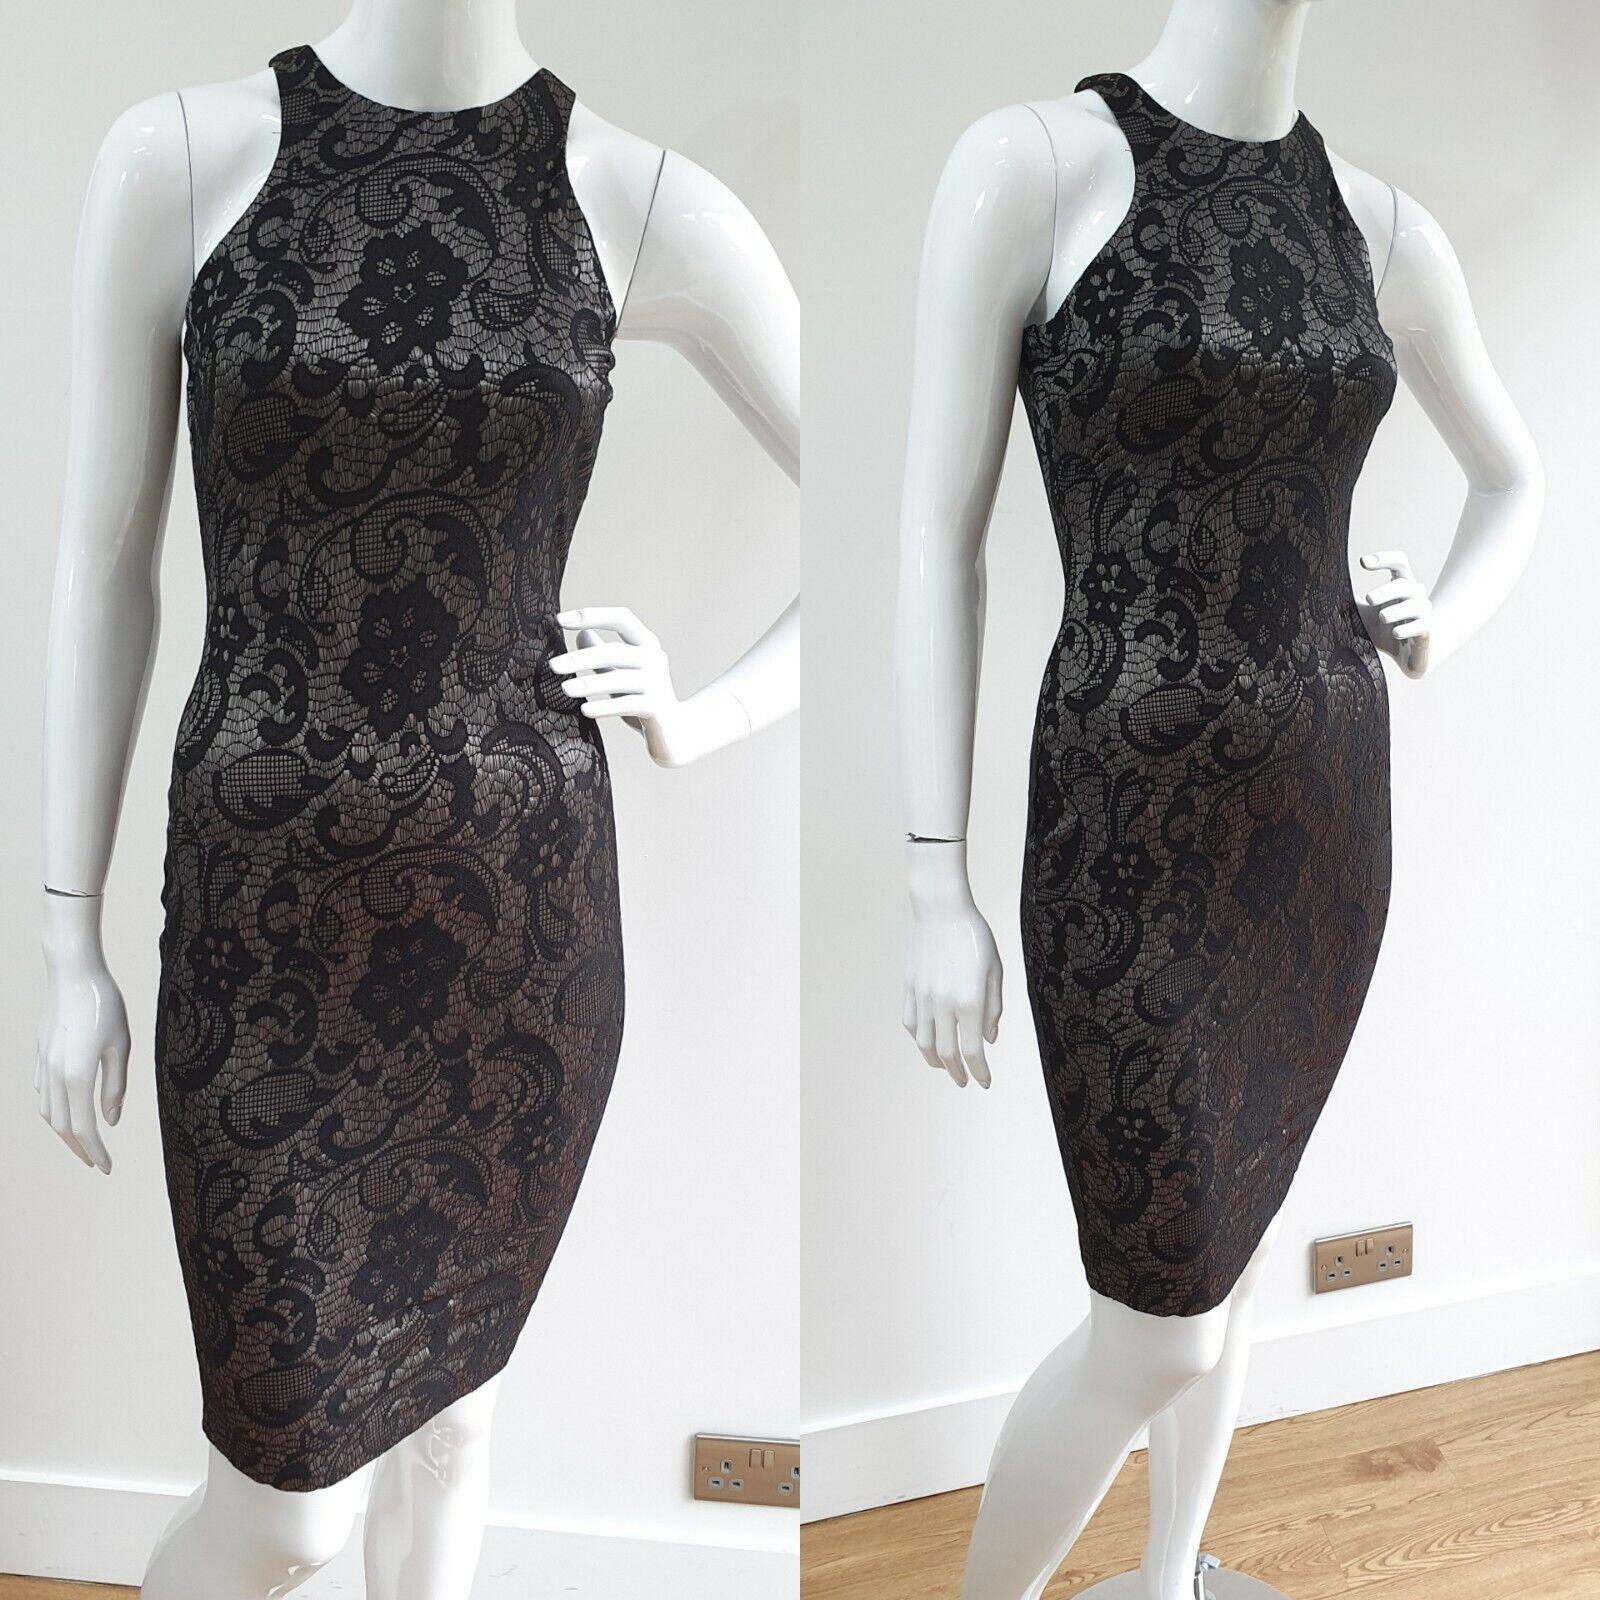 New AX PARIS Size 10 Black Silver Floral Lace Print Bodycon Stretch Dress Midi